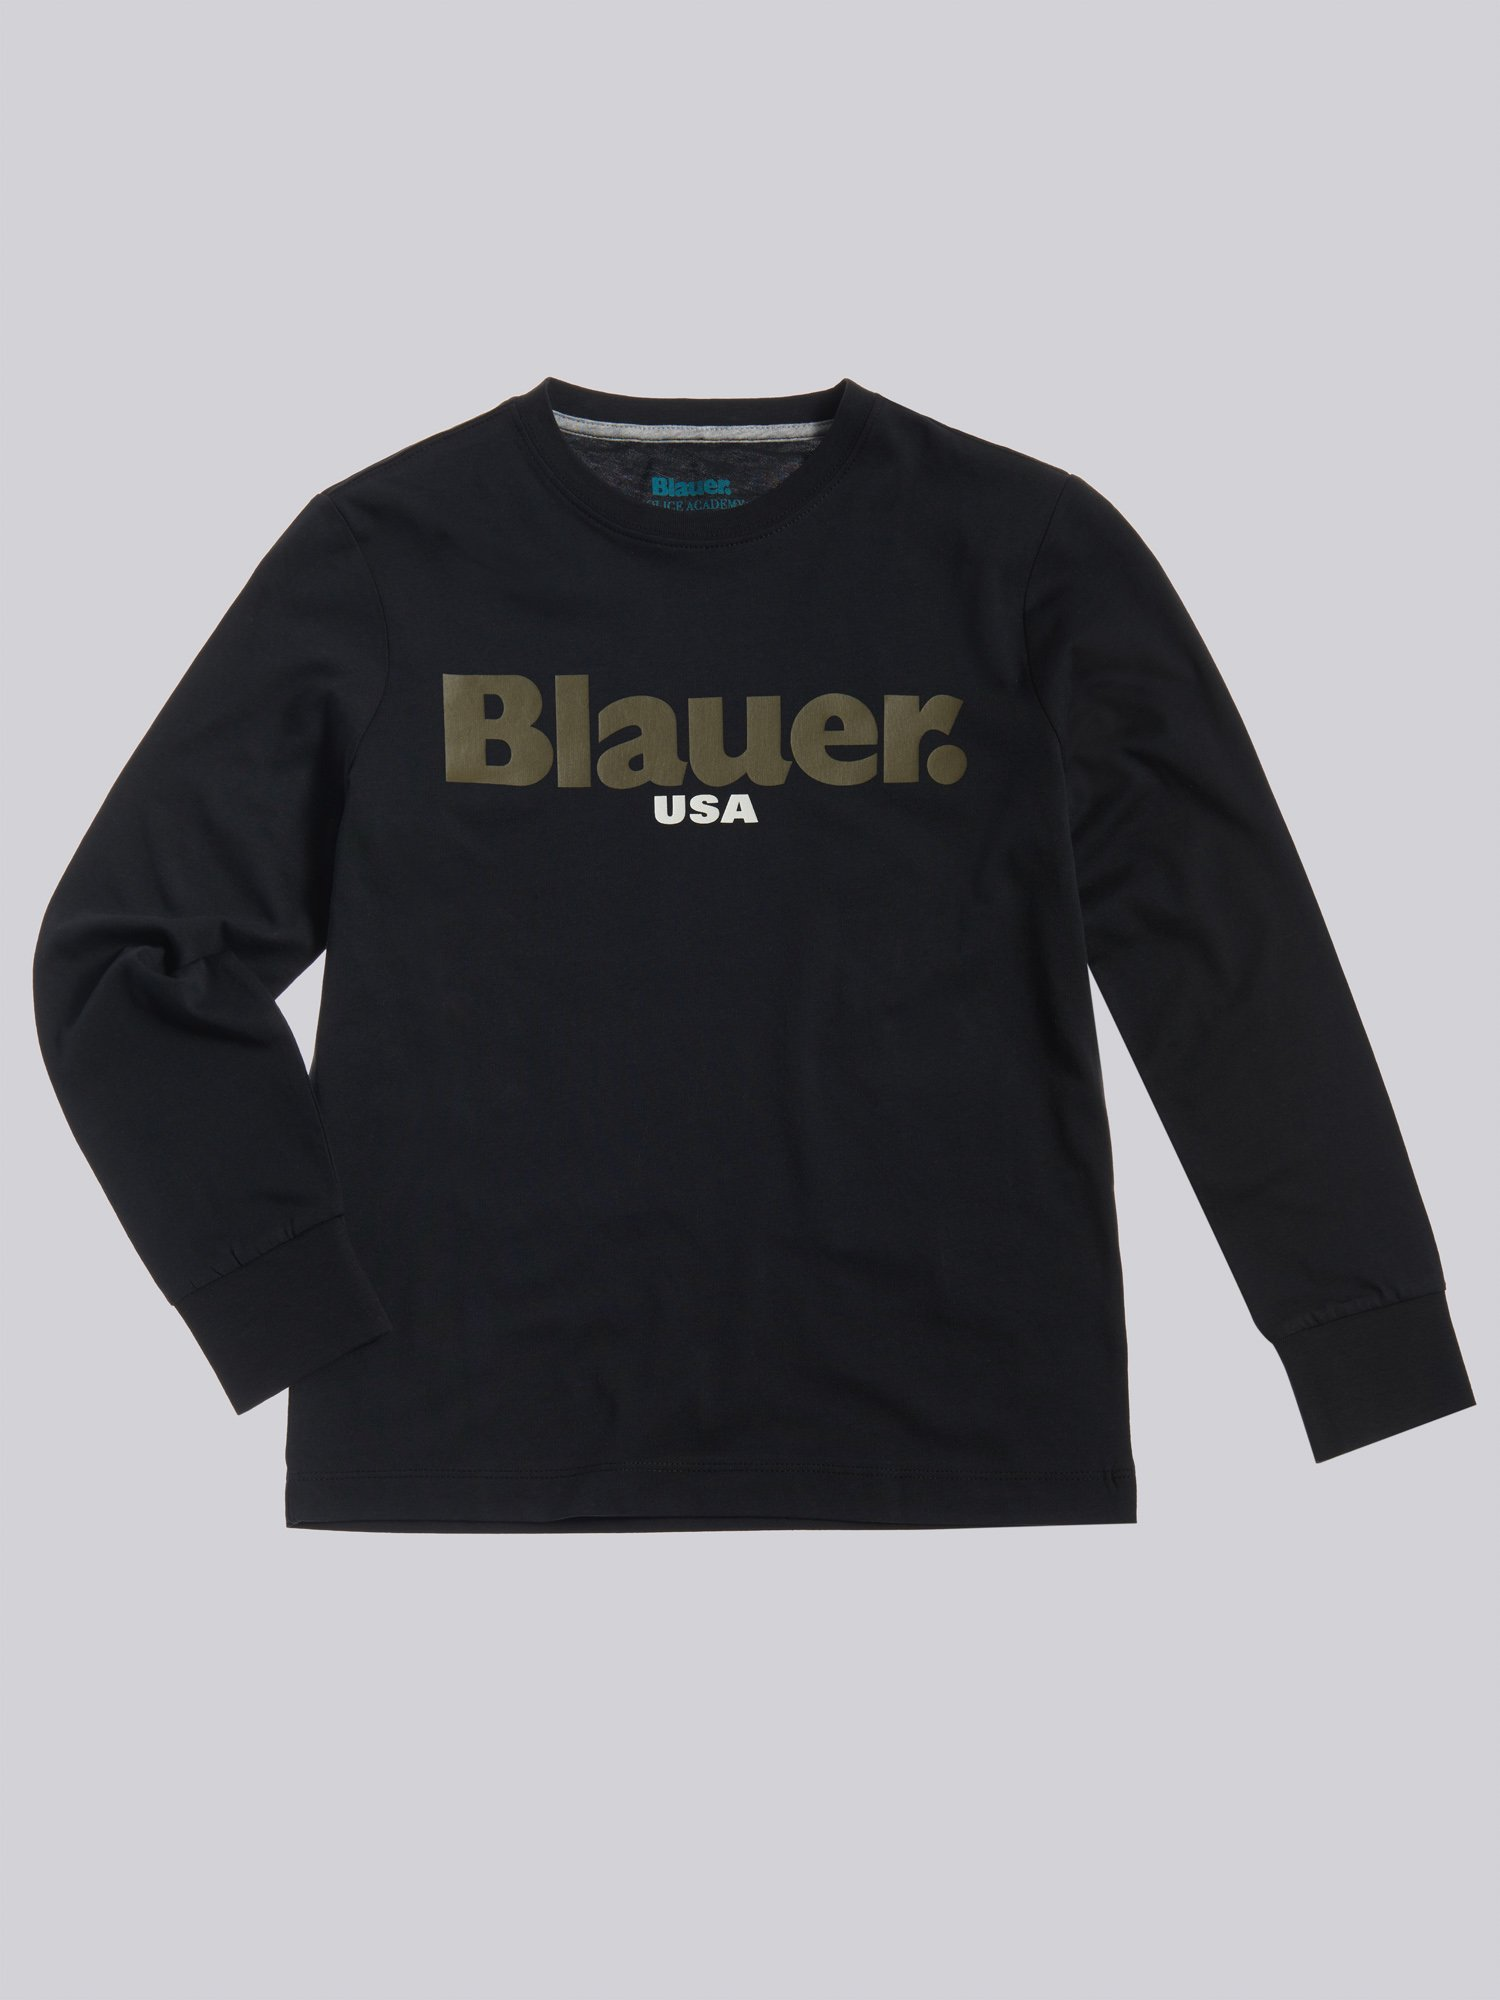 T-SHIRT MANCHE LONGUE BLAUER - Blauer